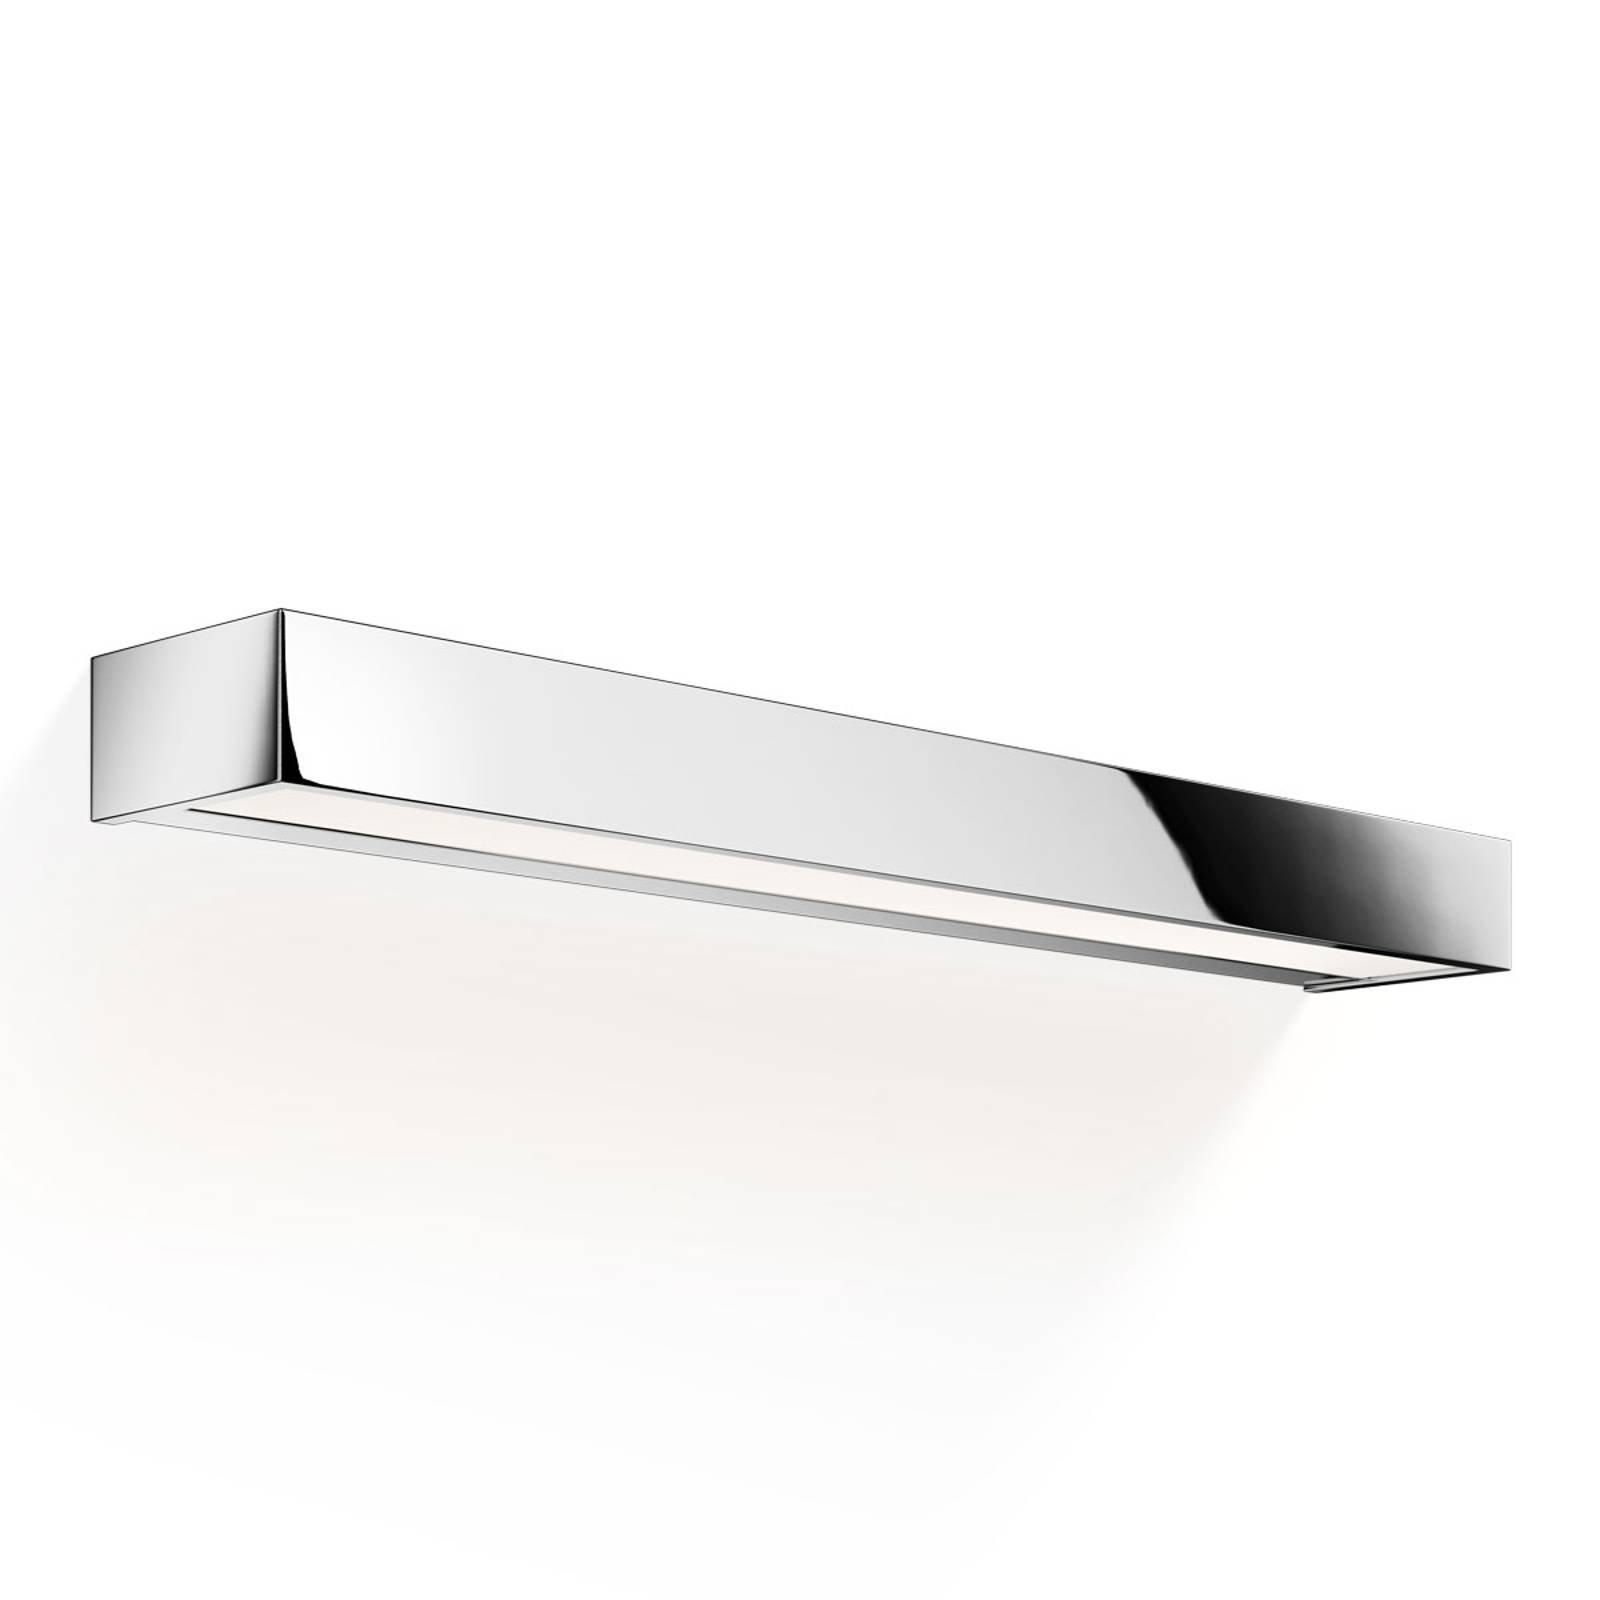 Decor Walther Box 60 N LED-vegglampe 3 000 K